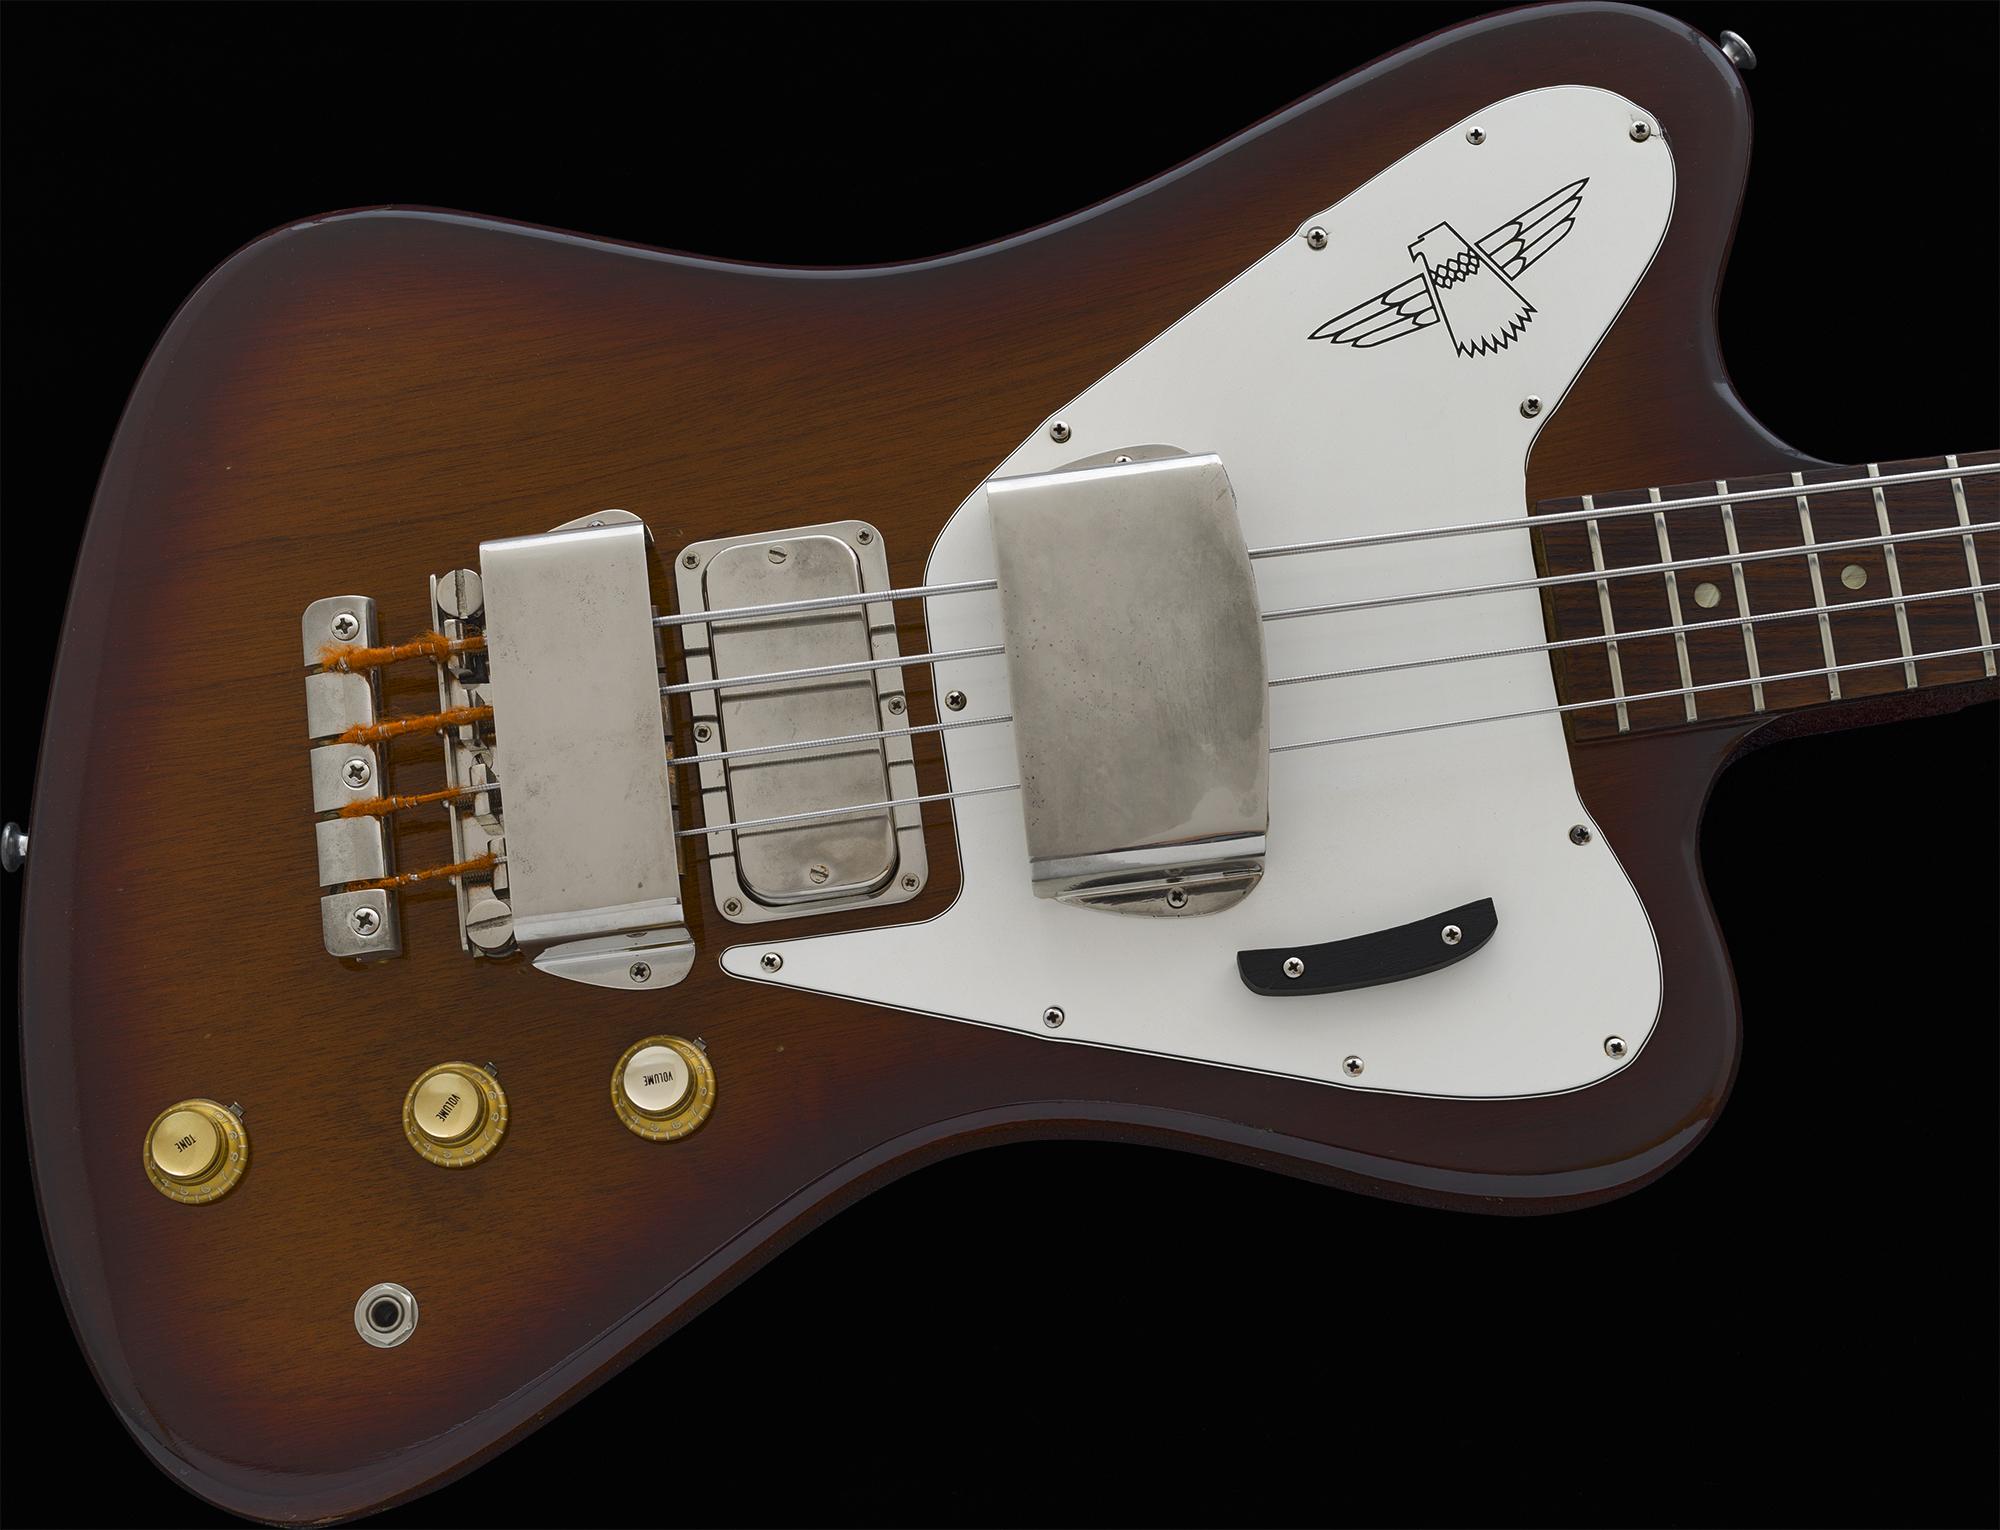 1966 Thunderbid IV bass, Clean, Original and Undamaged